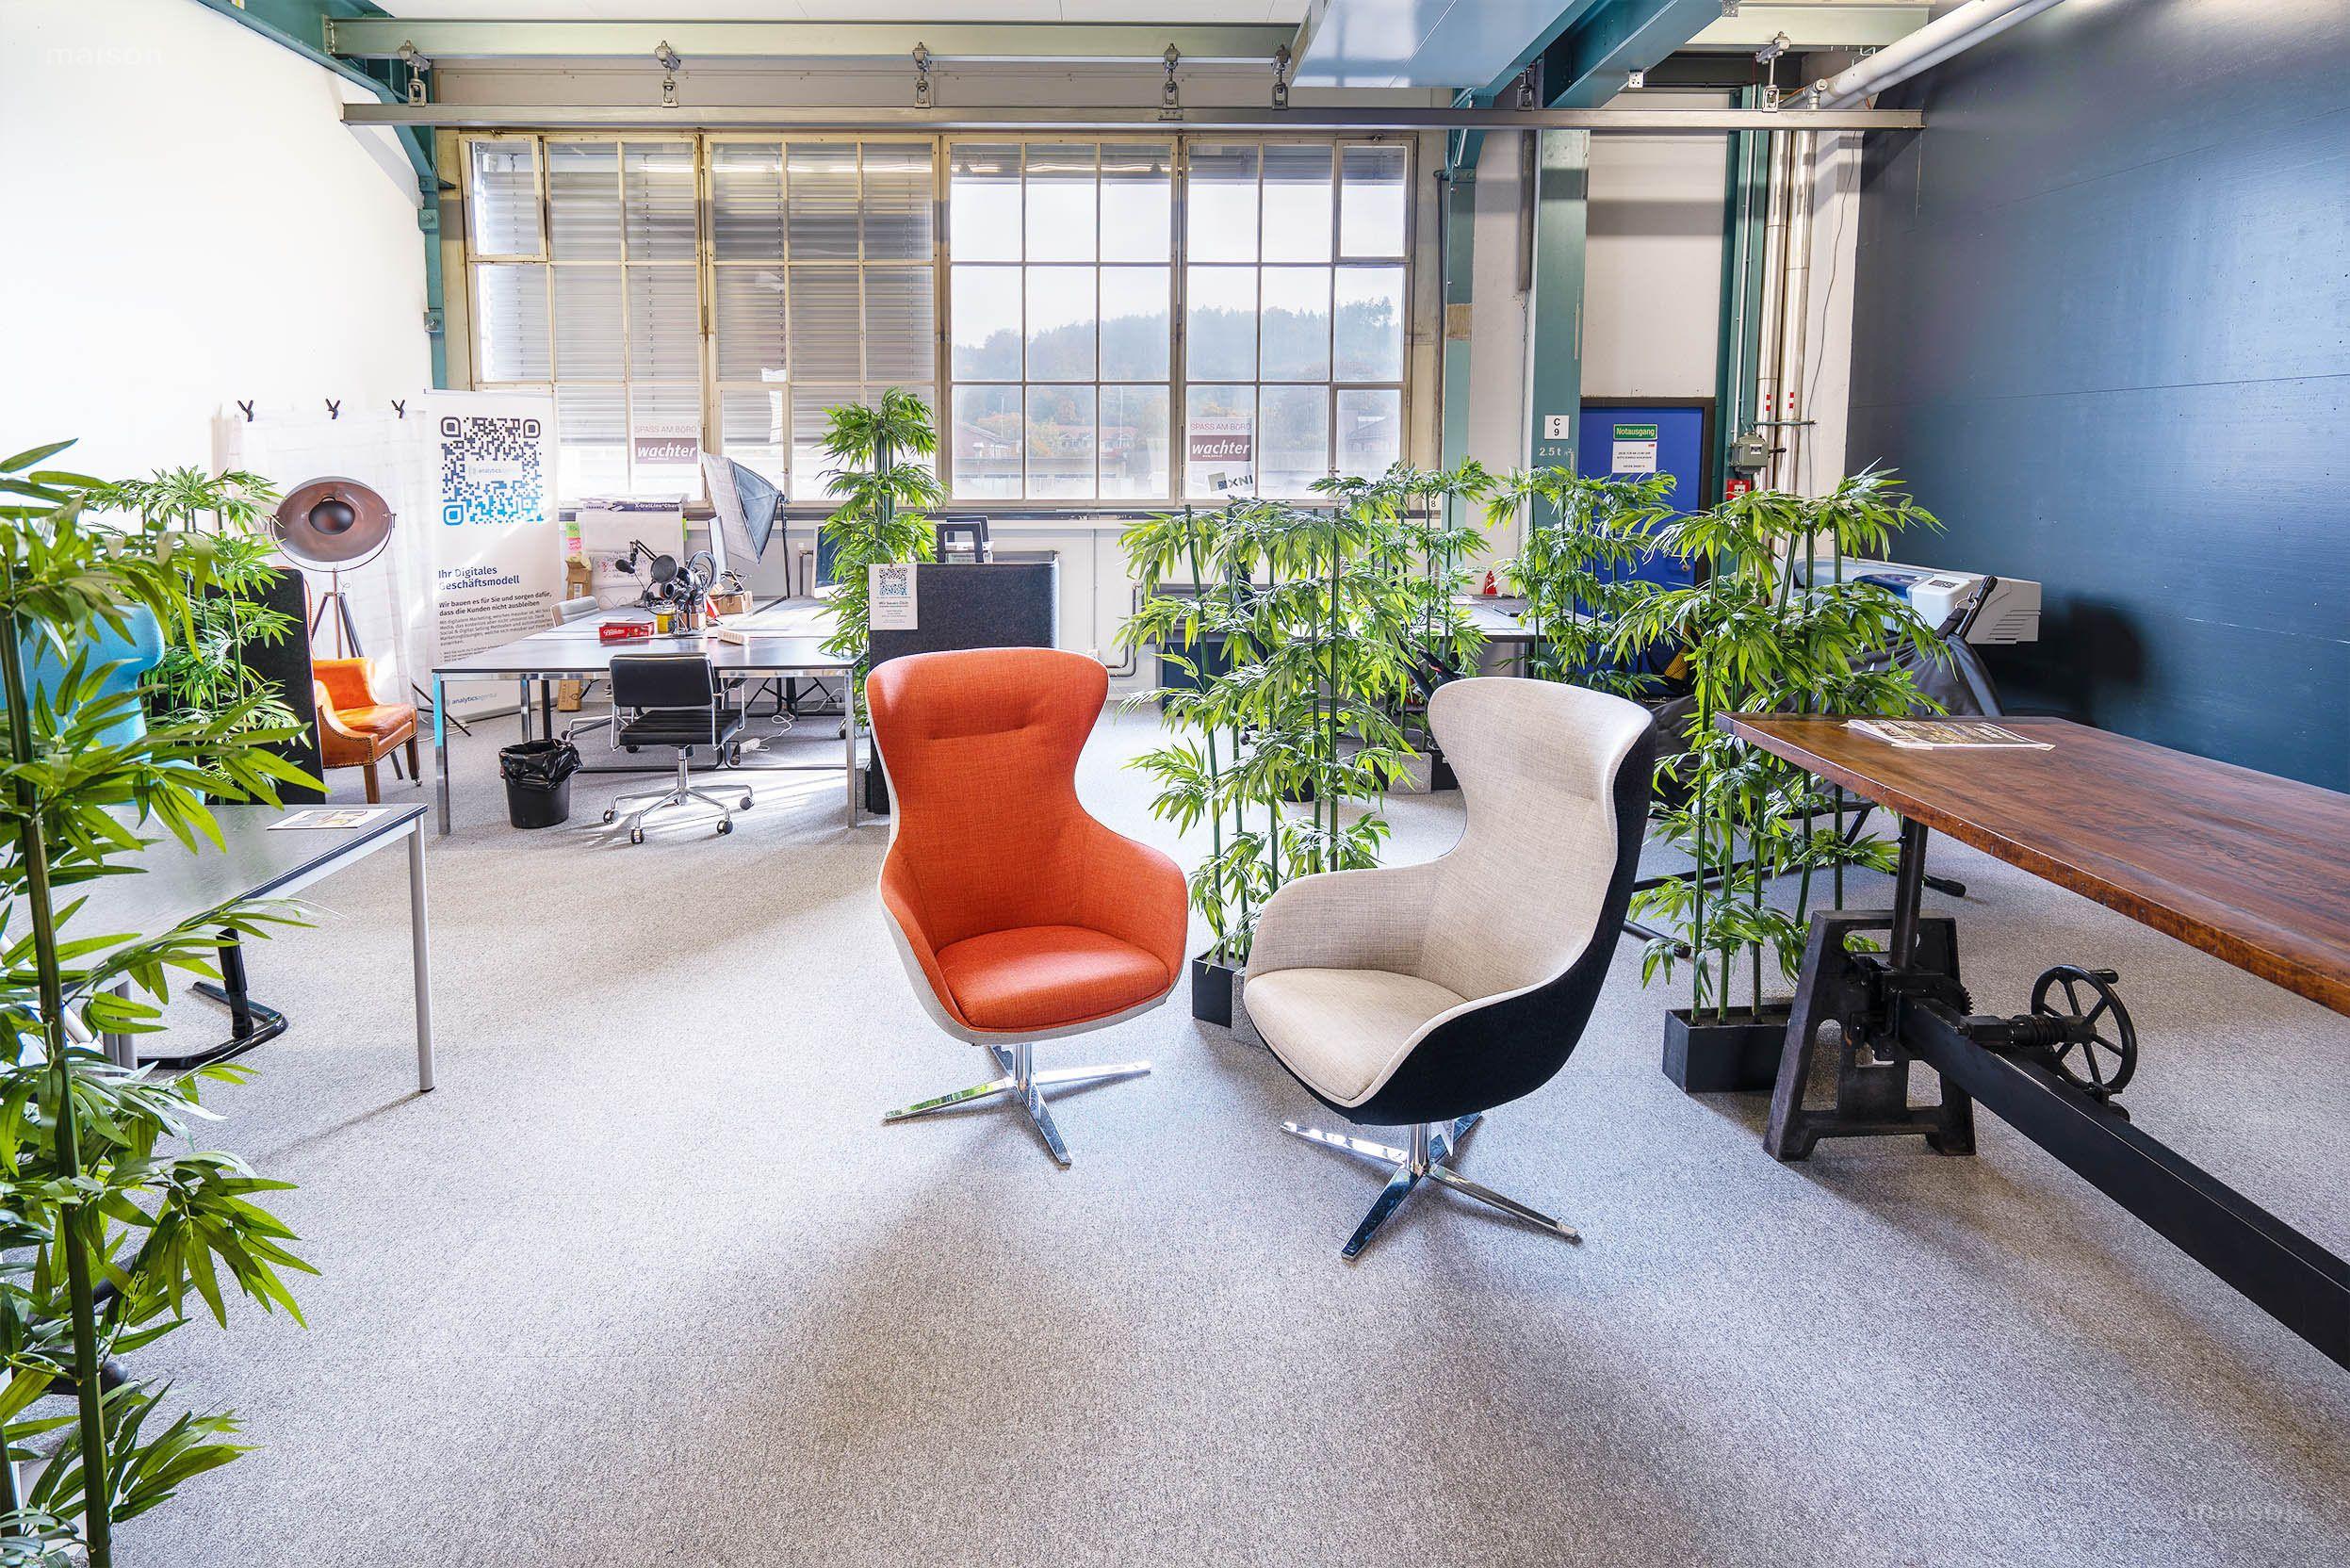 Foto Coworking Arbeitsplatz Home of Innovation Winterthur